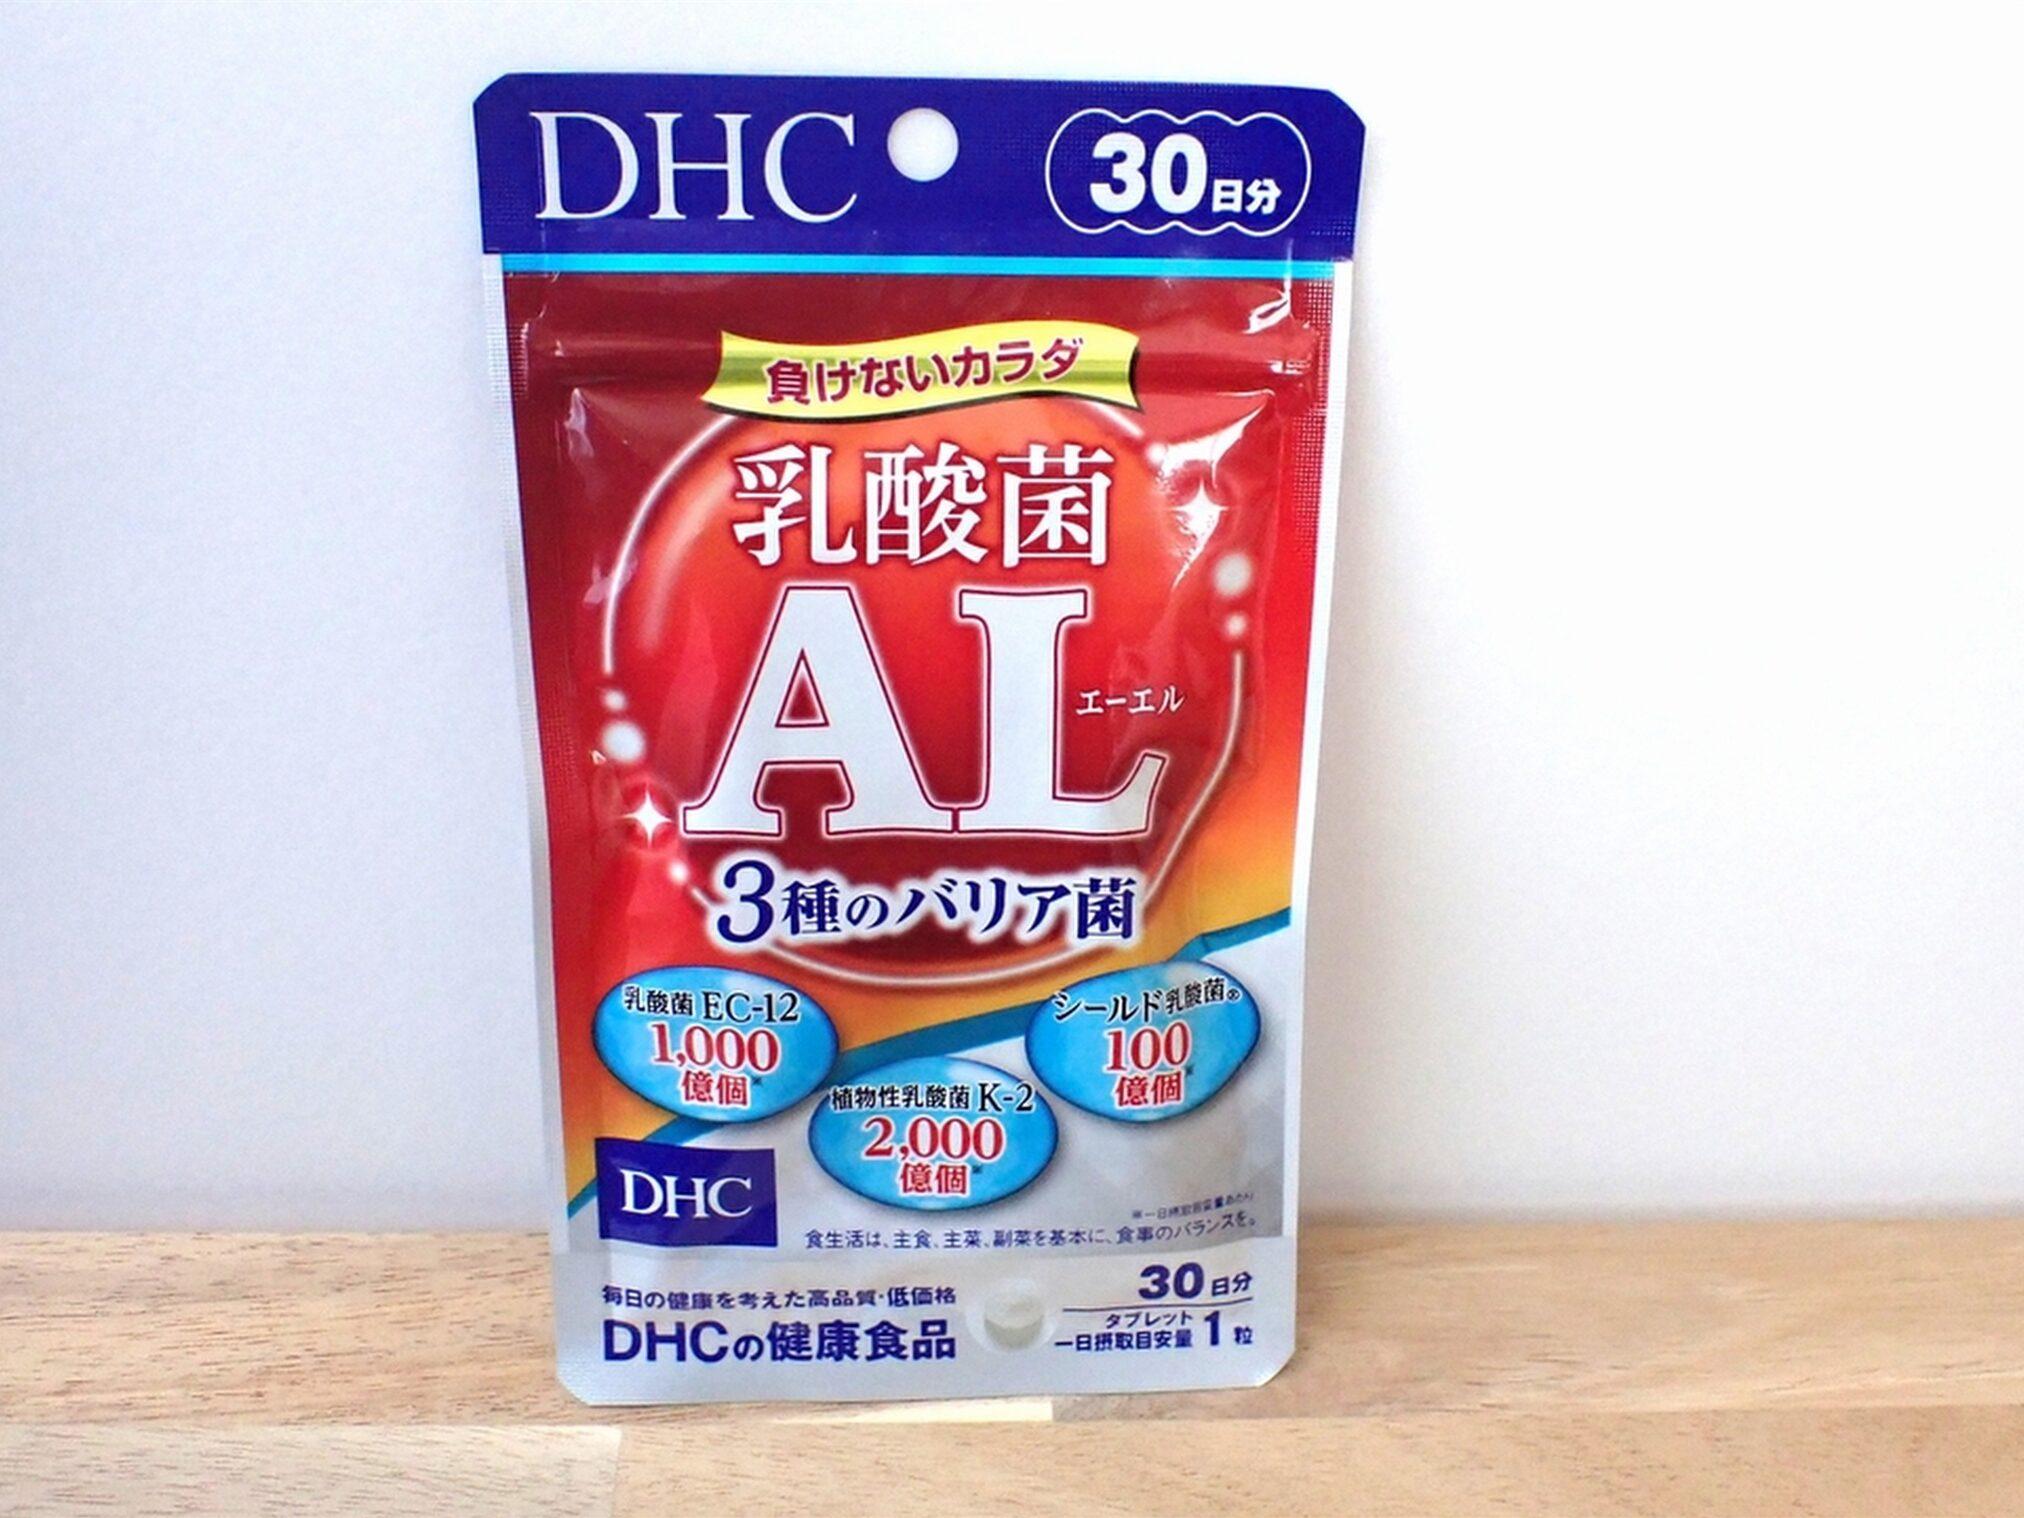 DHC 乳酸菌AL(エーエル) 3種のバリア菌 30日分、植物性乳酸菌K-2、K-2乳酸菌配合のサプリメント